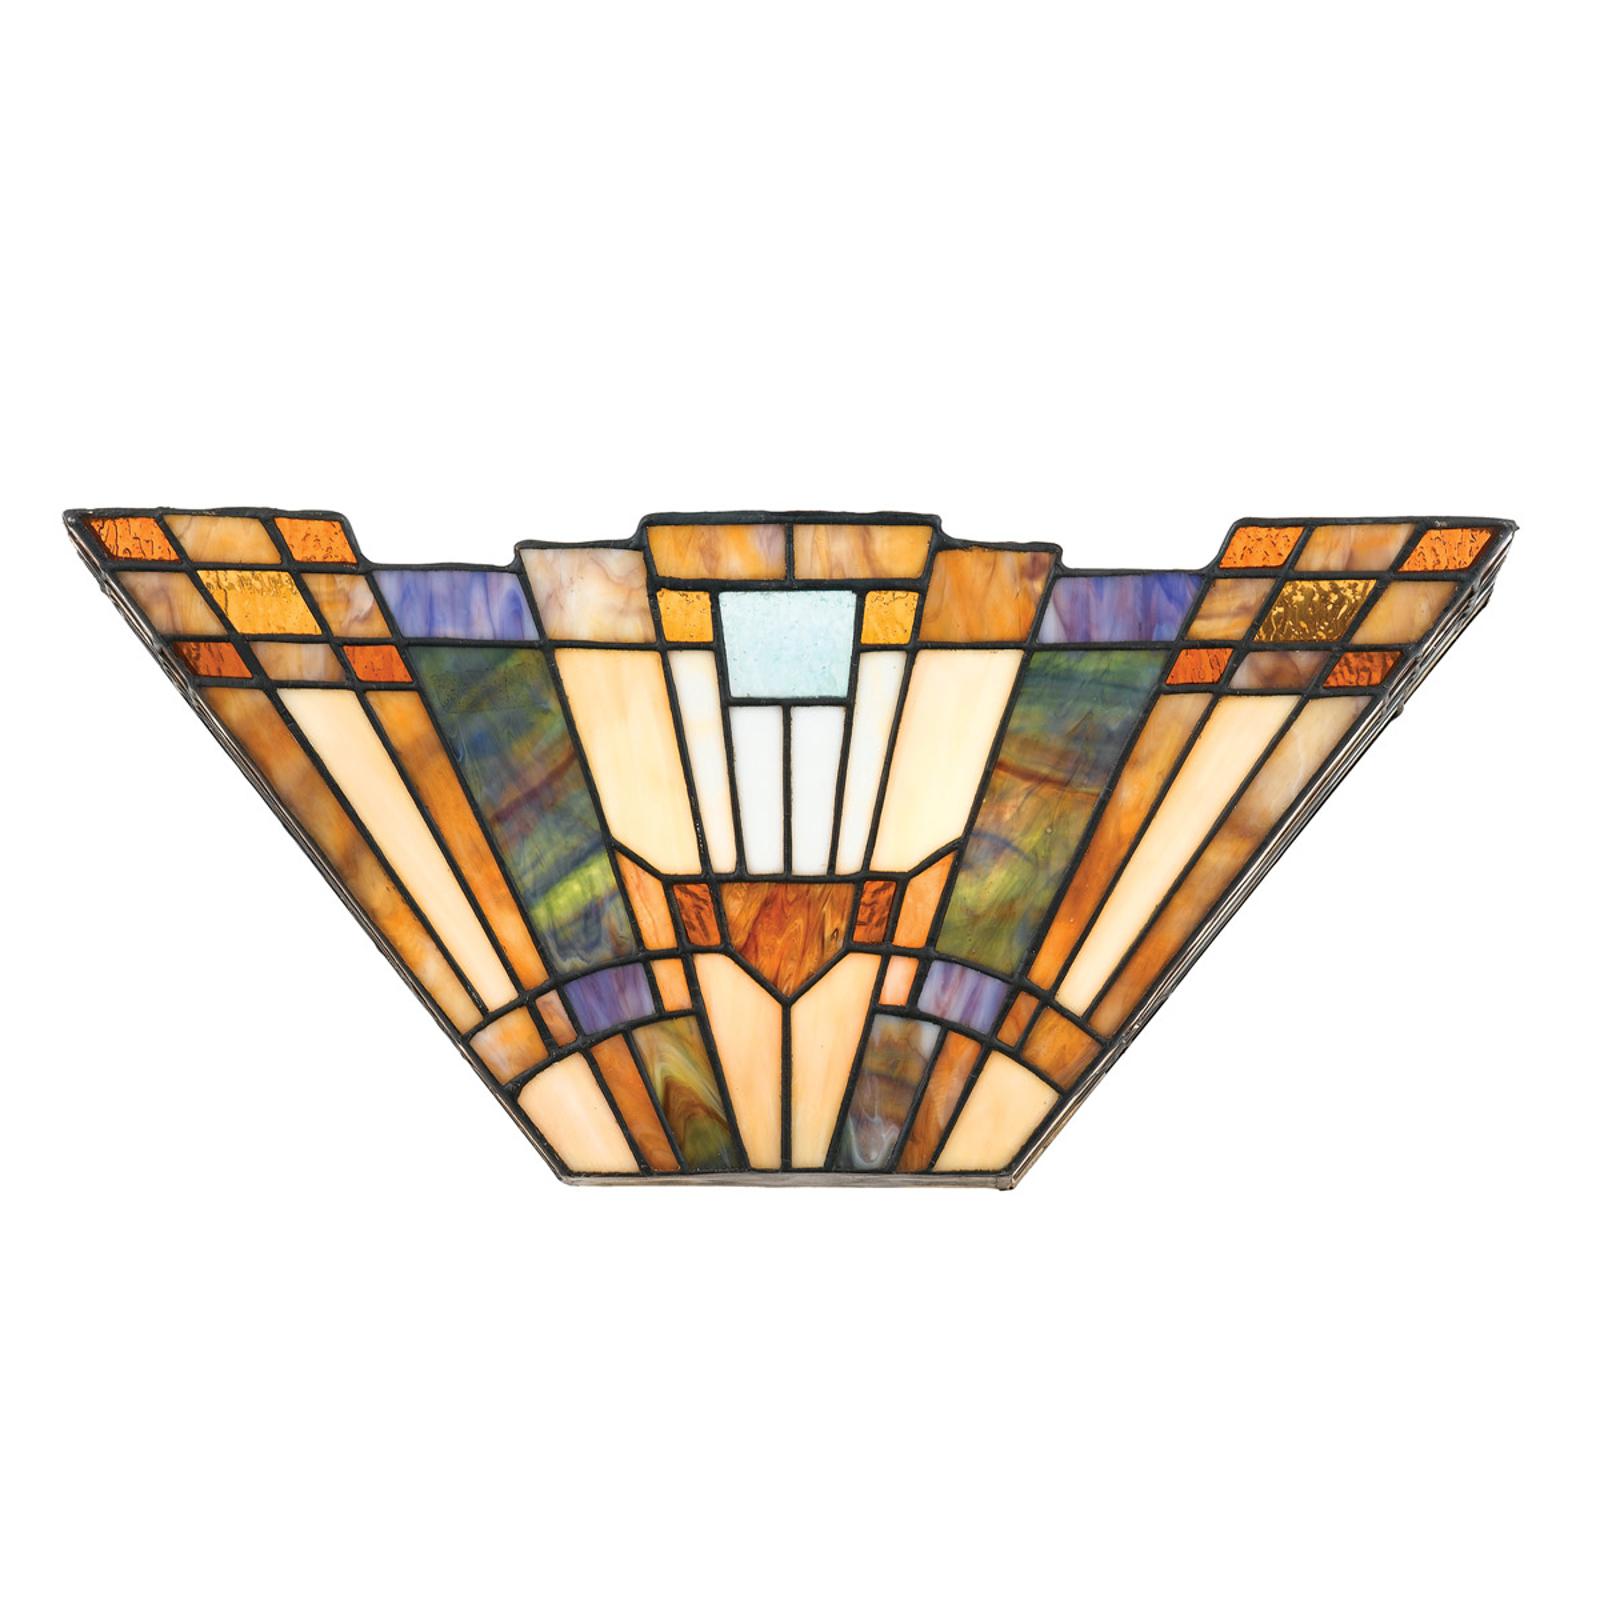 Wandleuchte Inglenook mit buntem Glas